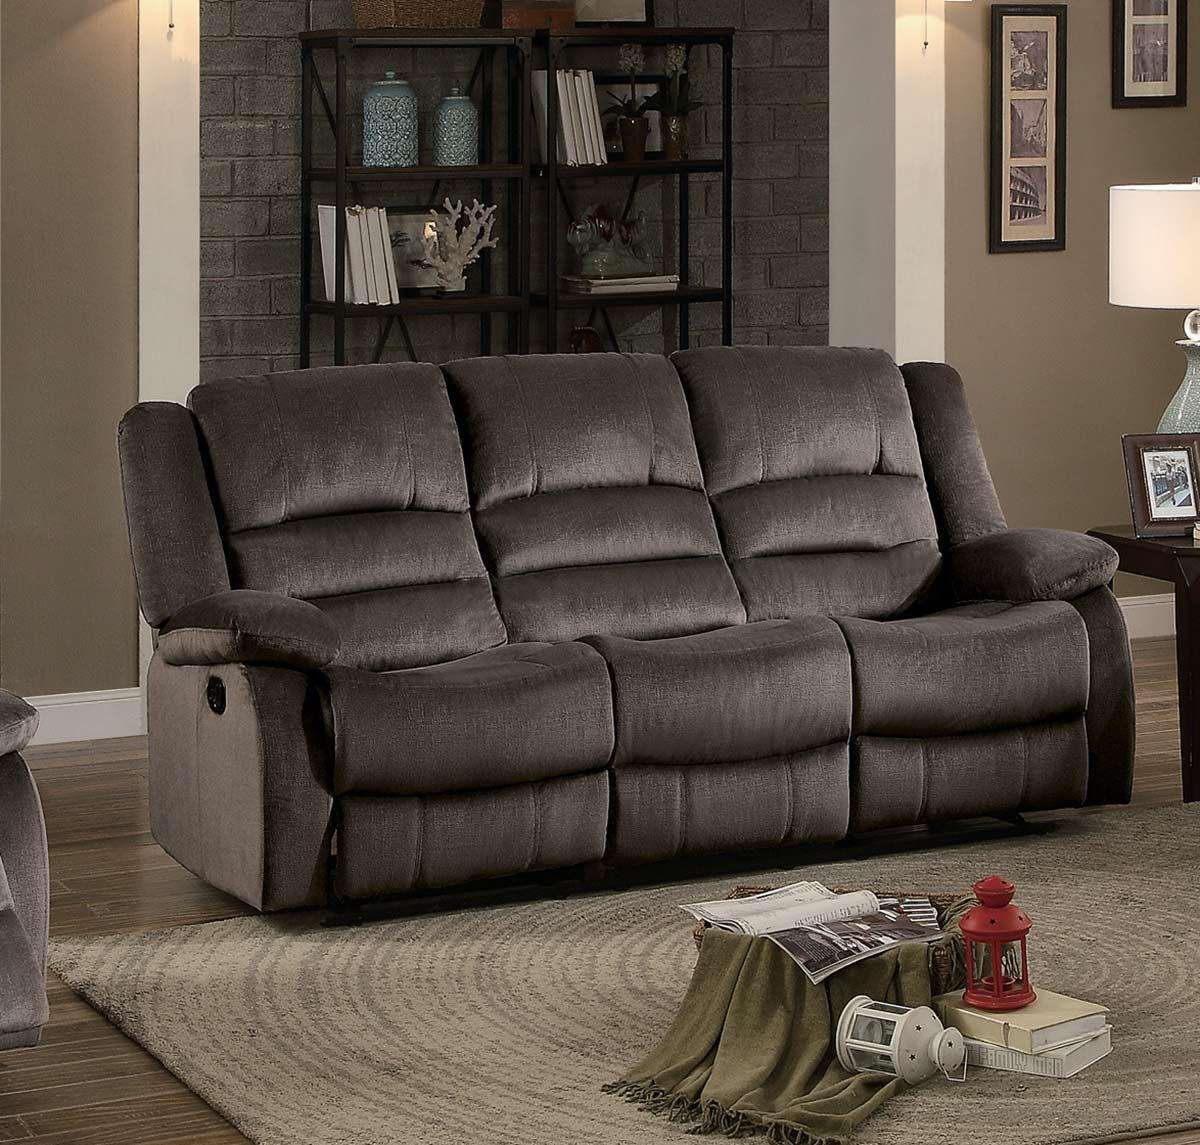 Homelegance Jarita Double Reclining Sofa - Chocolate Fabric